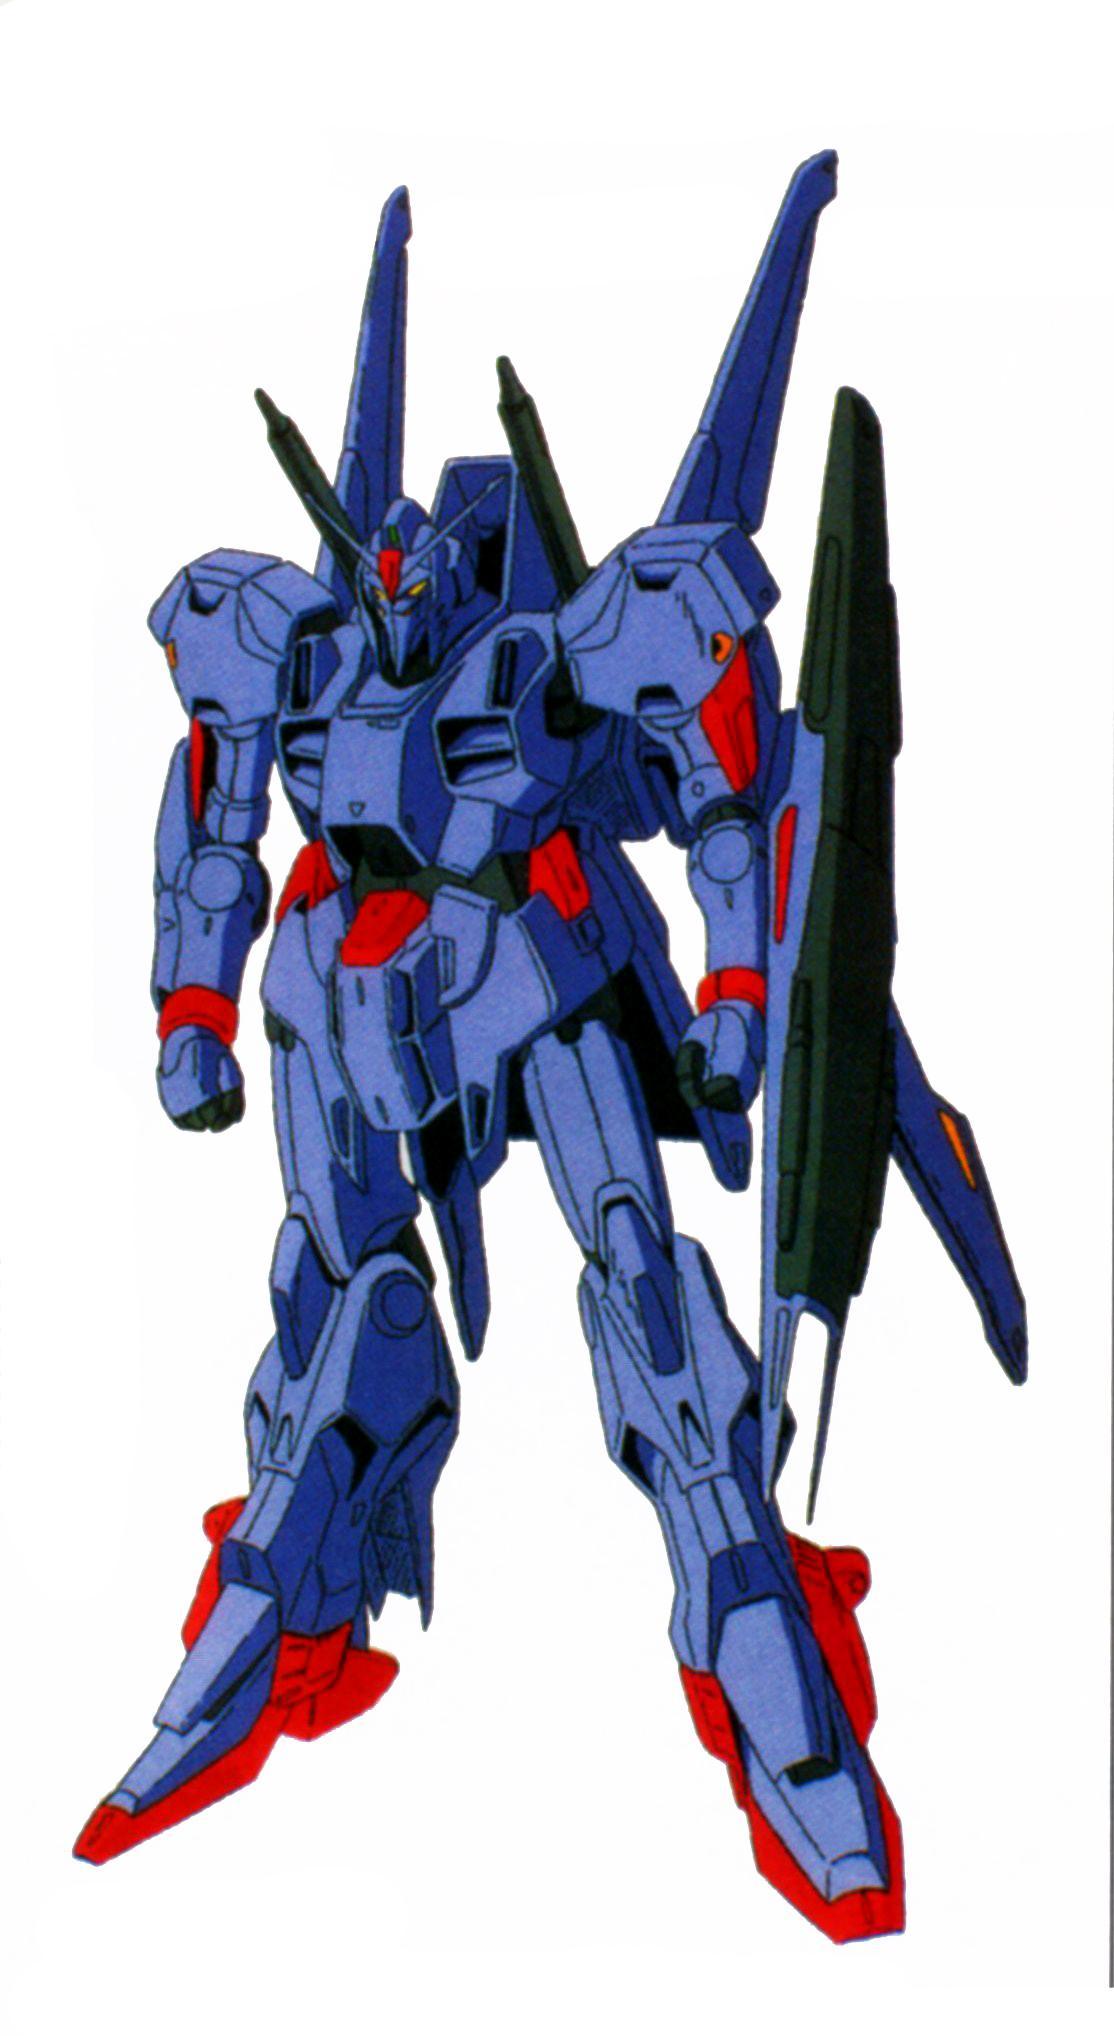 Metric To Standard >> MSF-007 Gundam Mk-III - Gundam Wiki